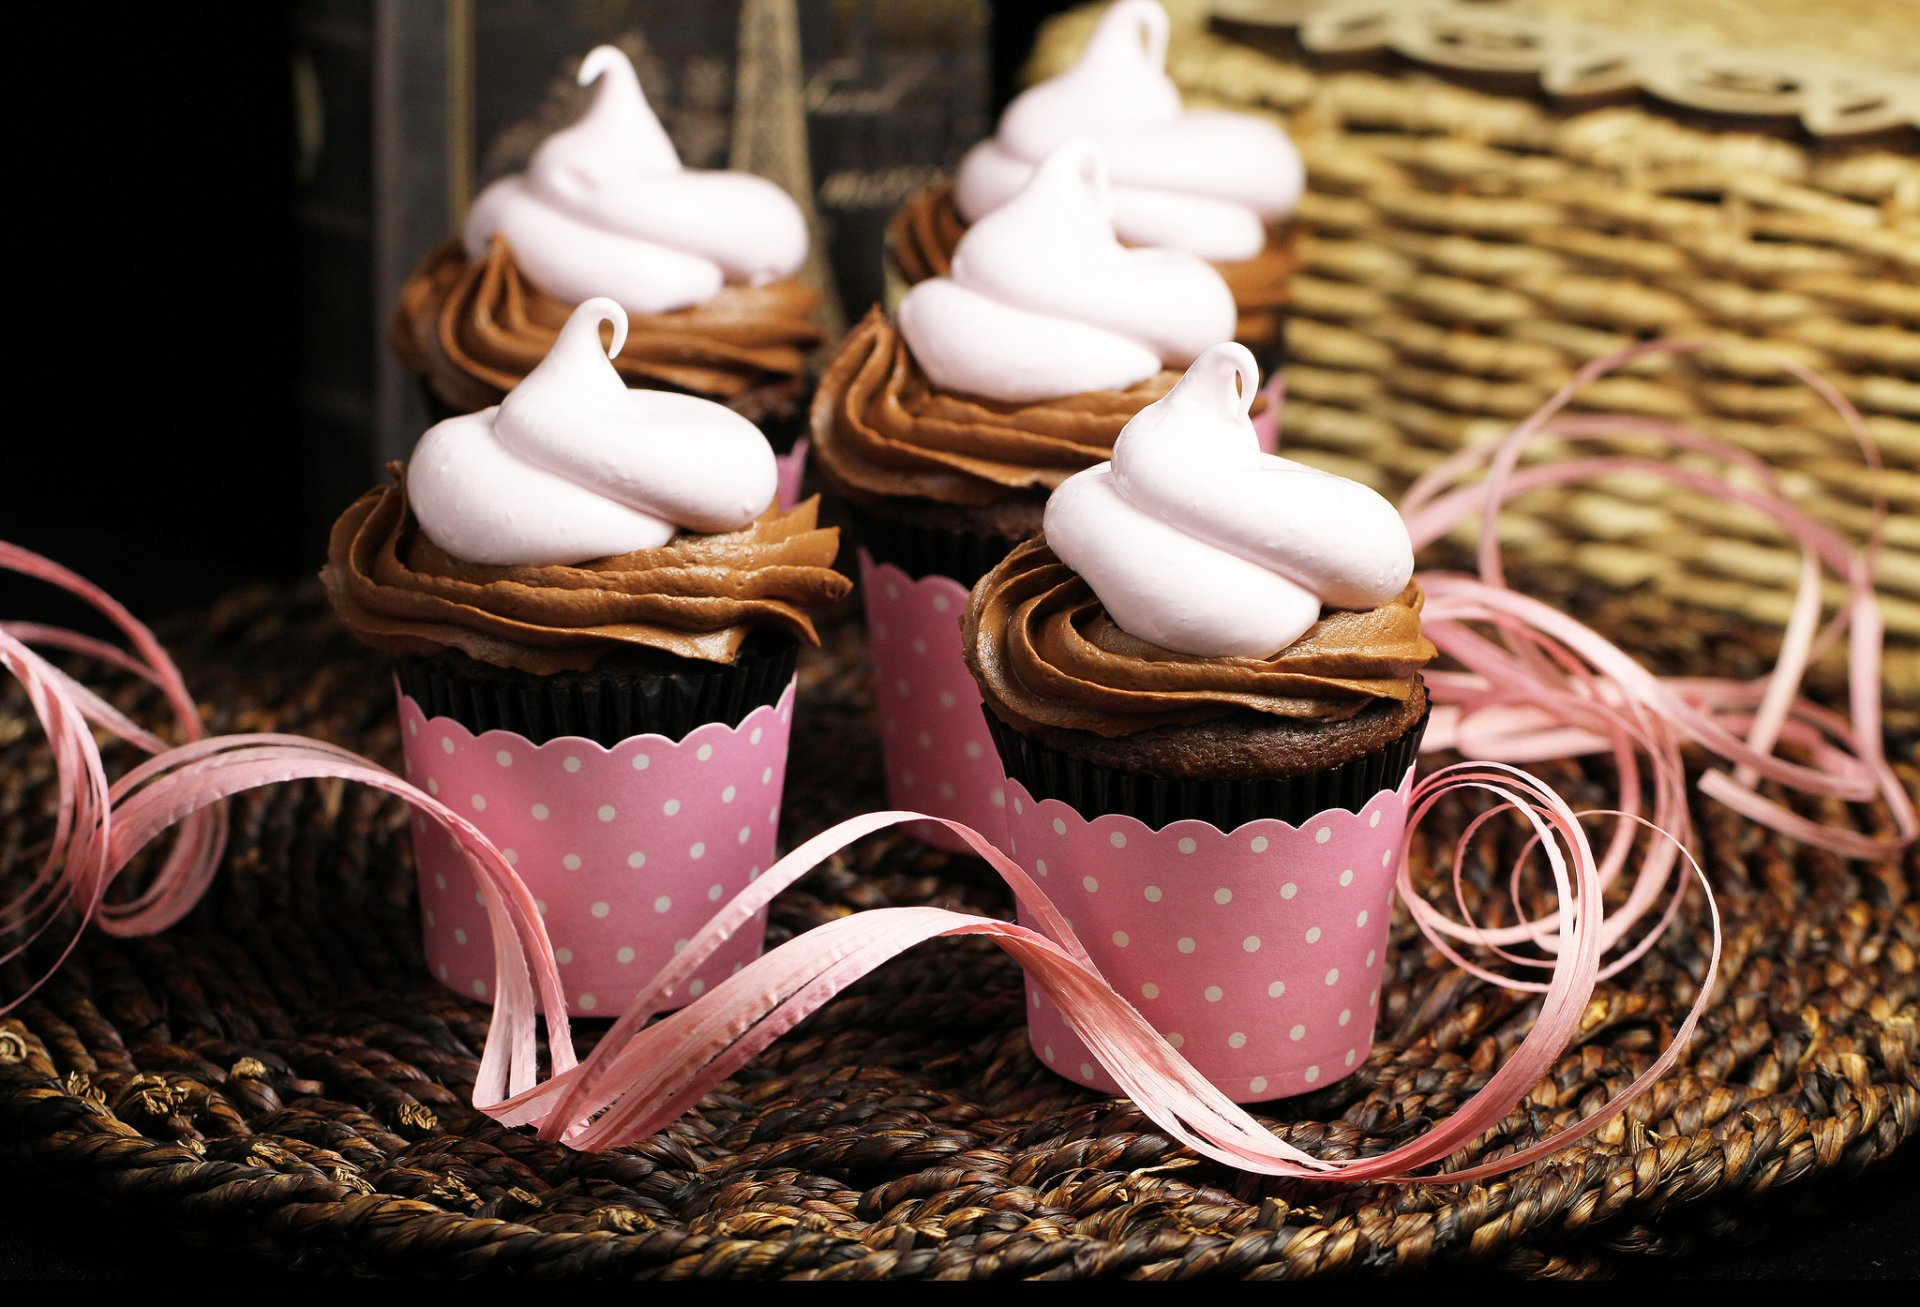 еда кекс шоколад food cupcake chocolate бесплатно